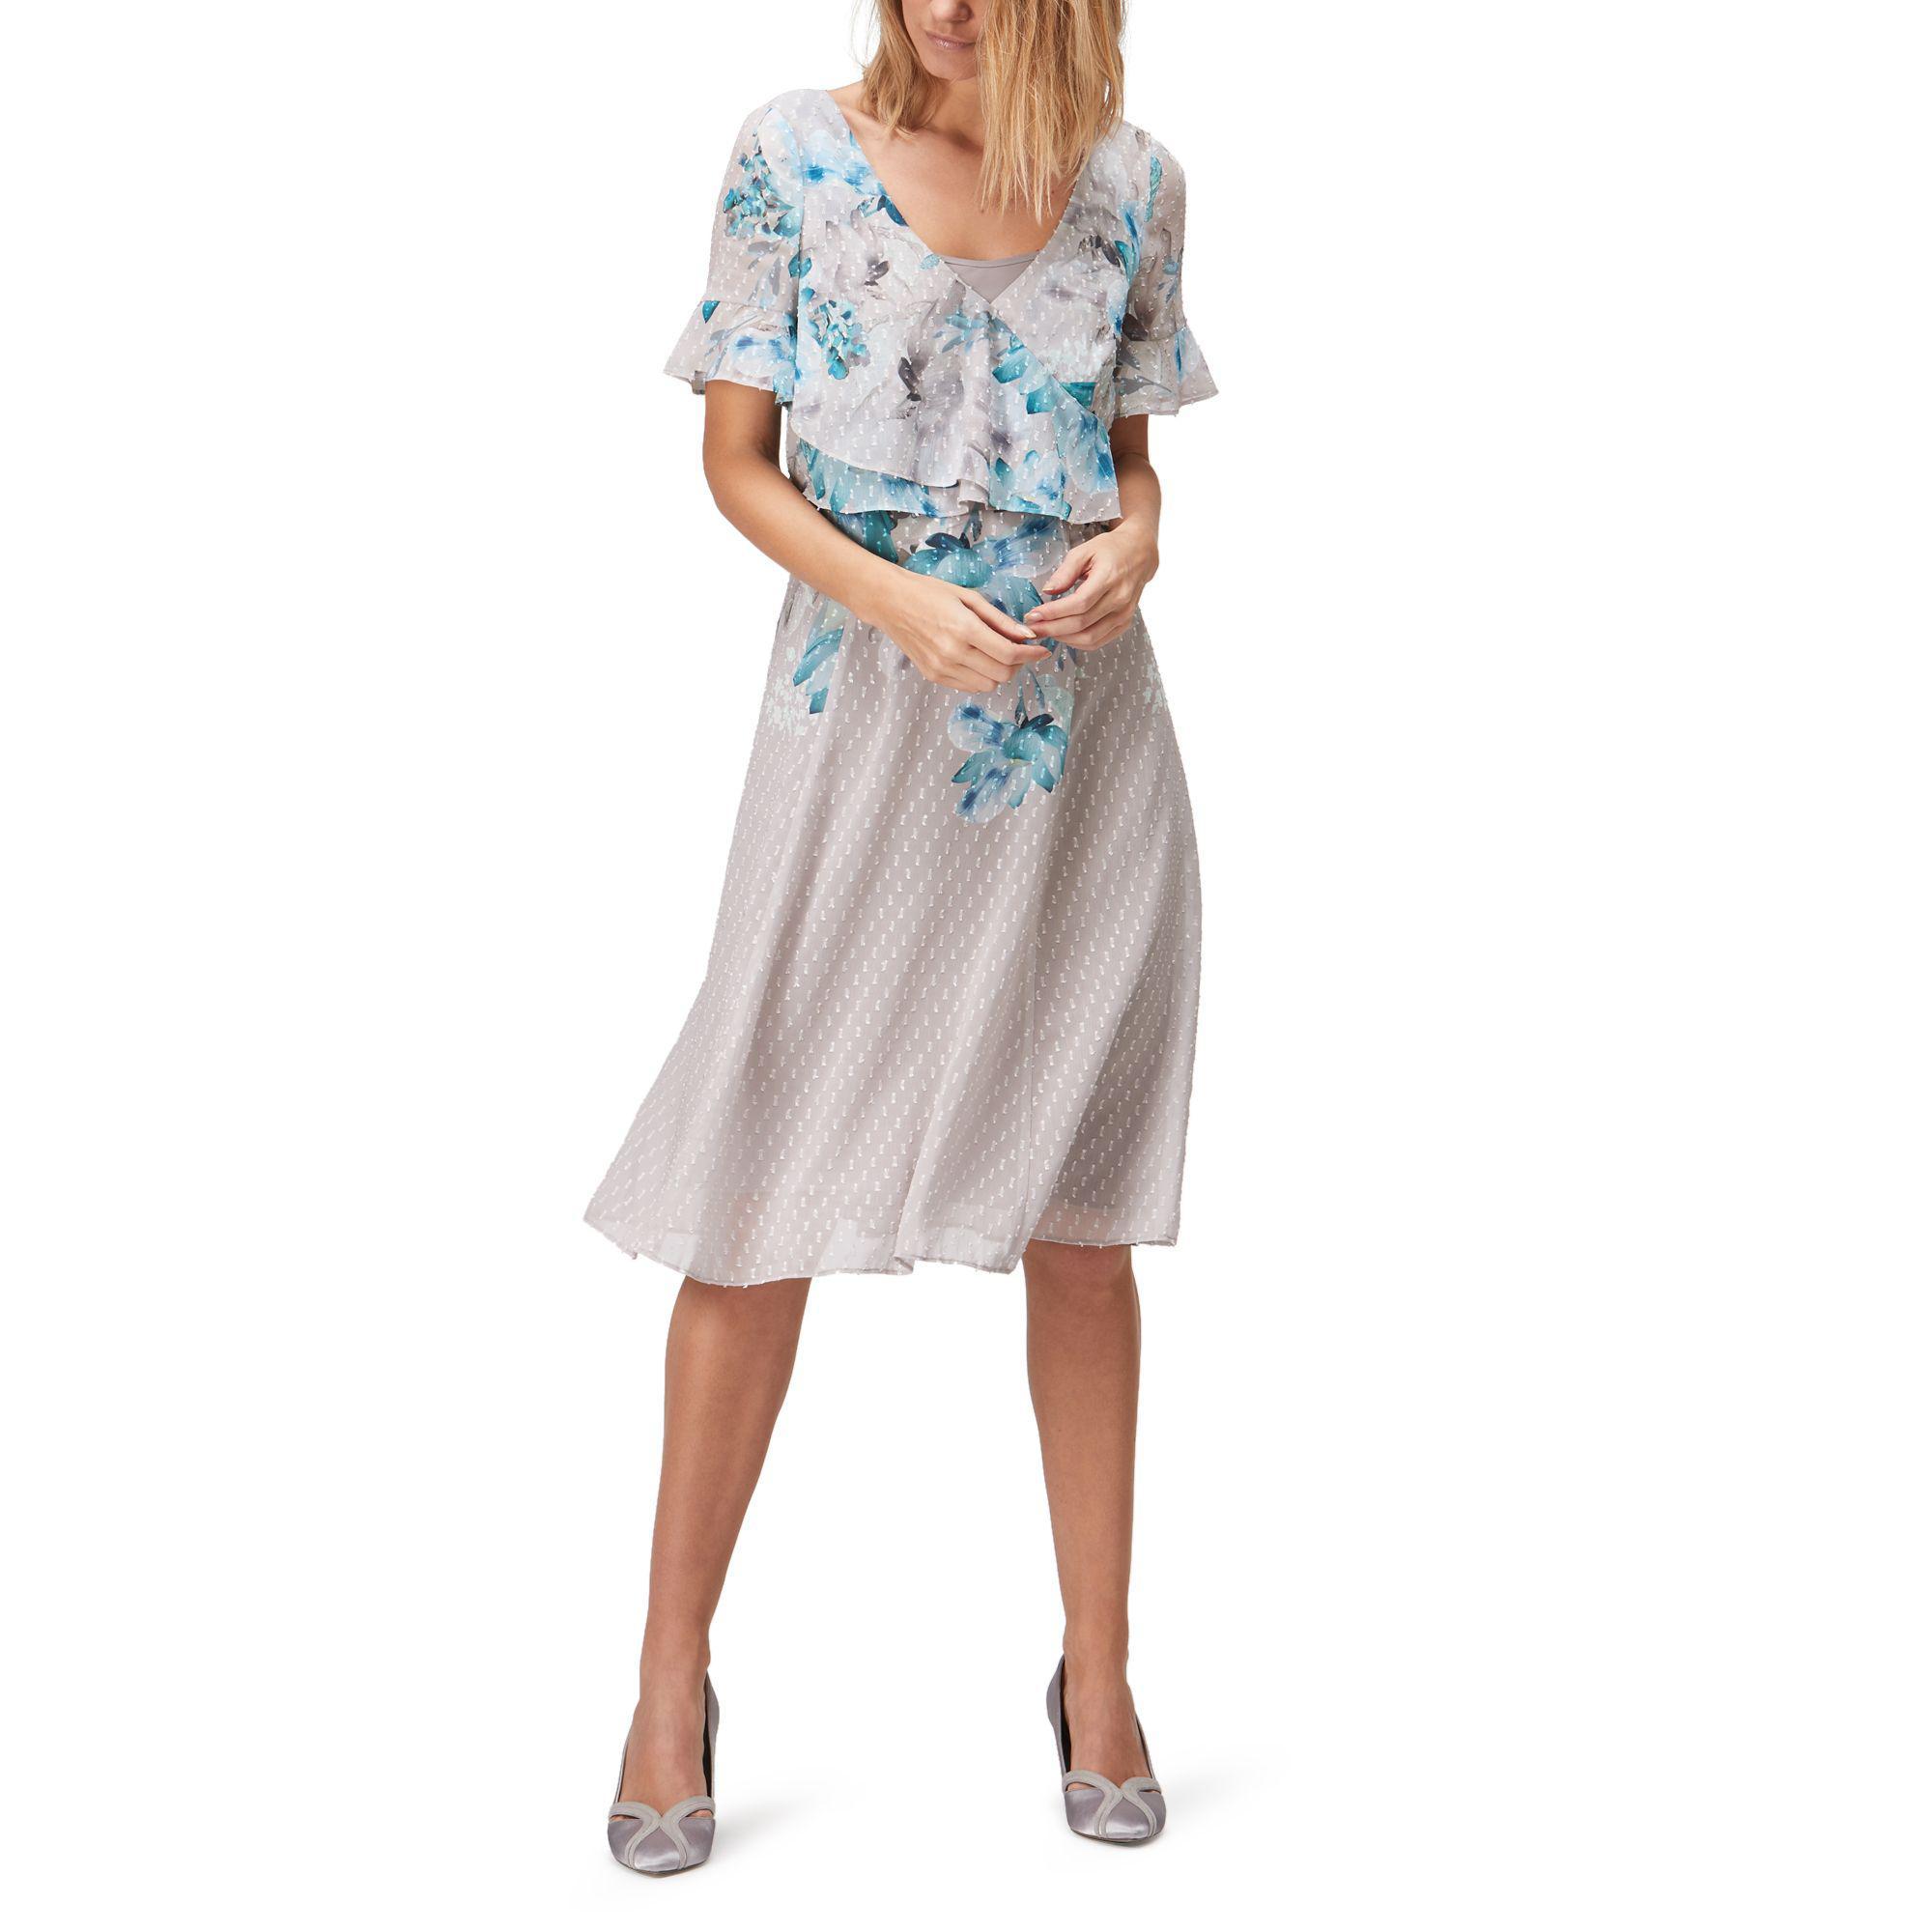 b7115139d4e Jacques Vert Printed Dobby Soft Dress - Lyst